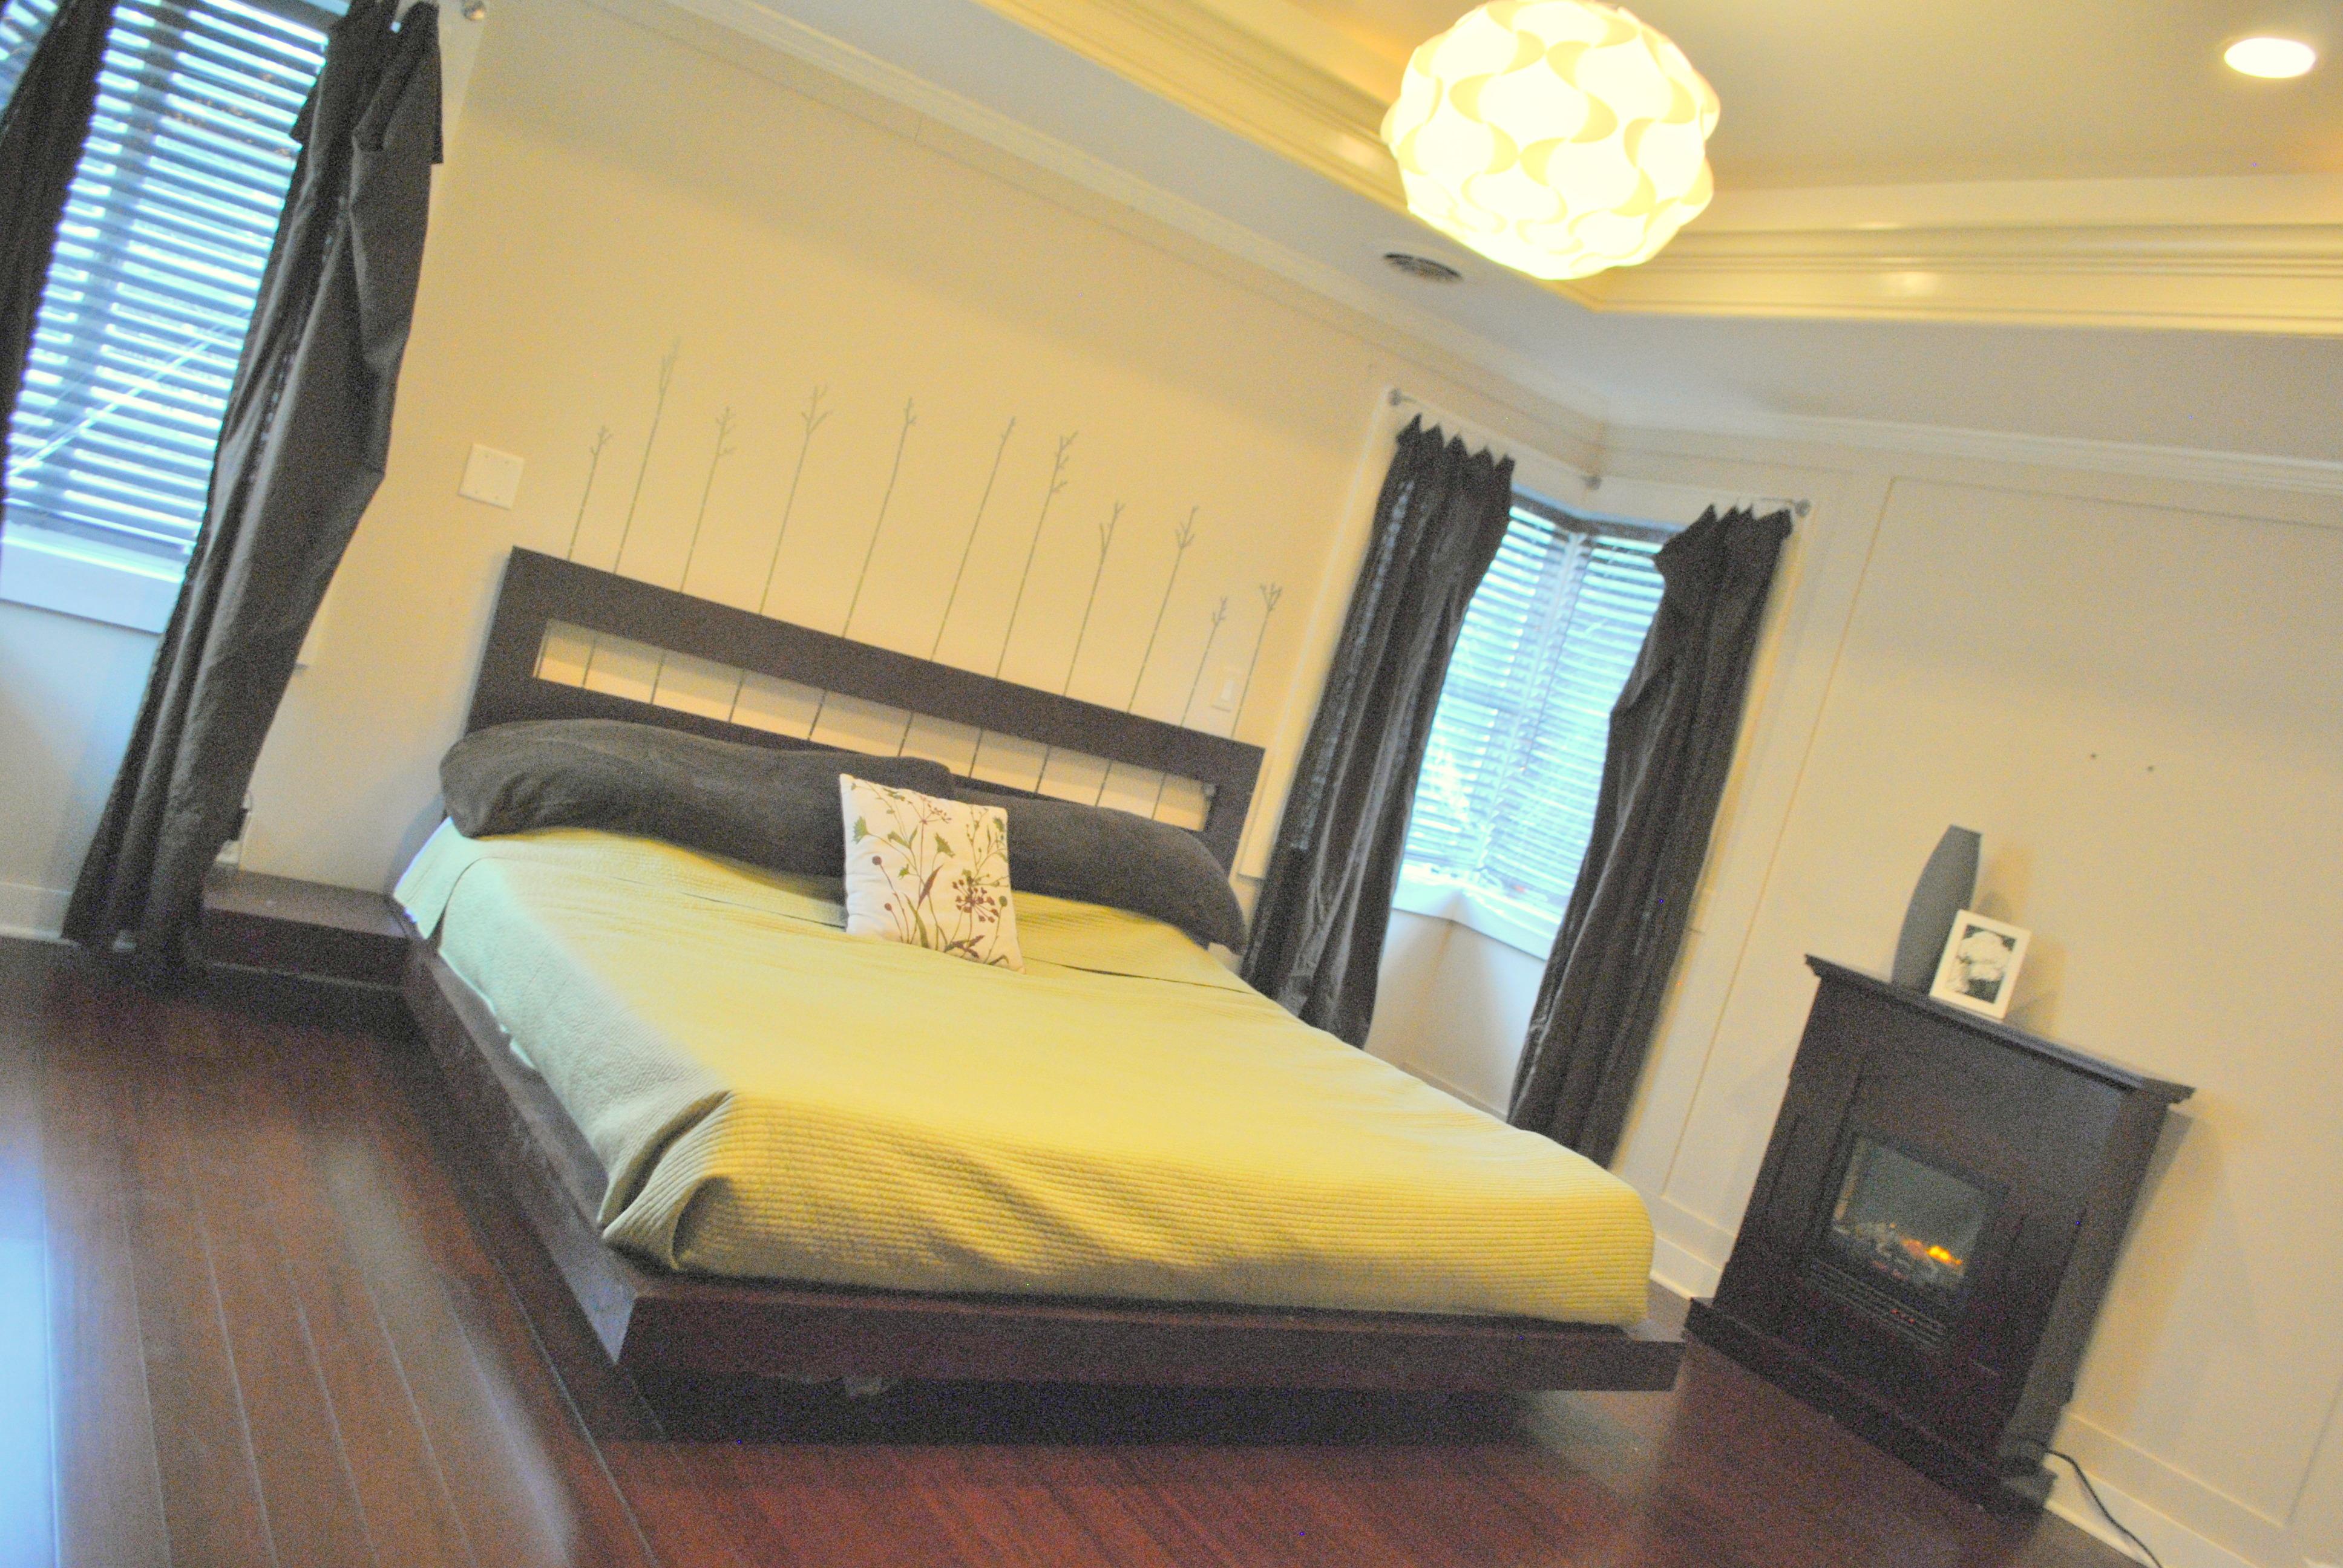 How to make a king size bed - King Size Bed Platform Diy